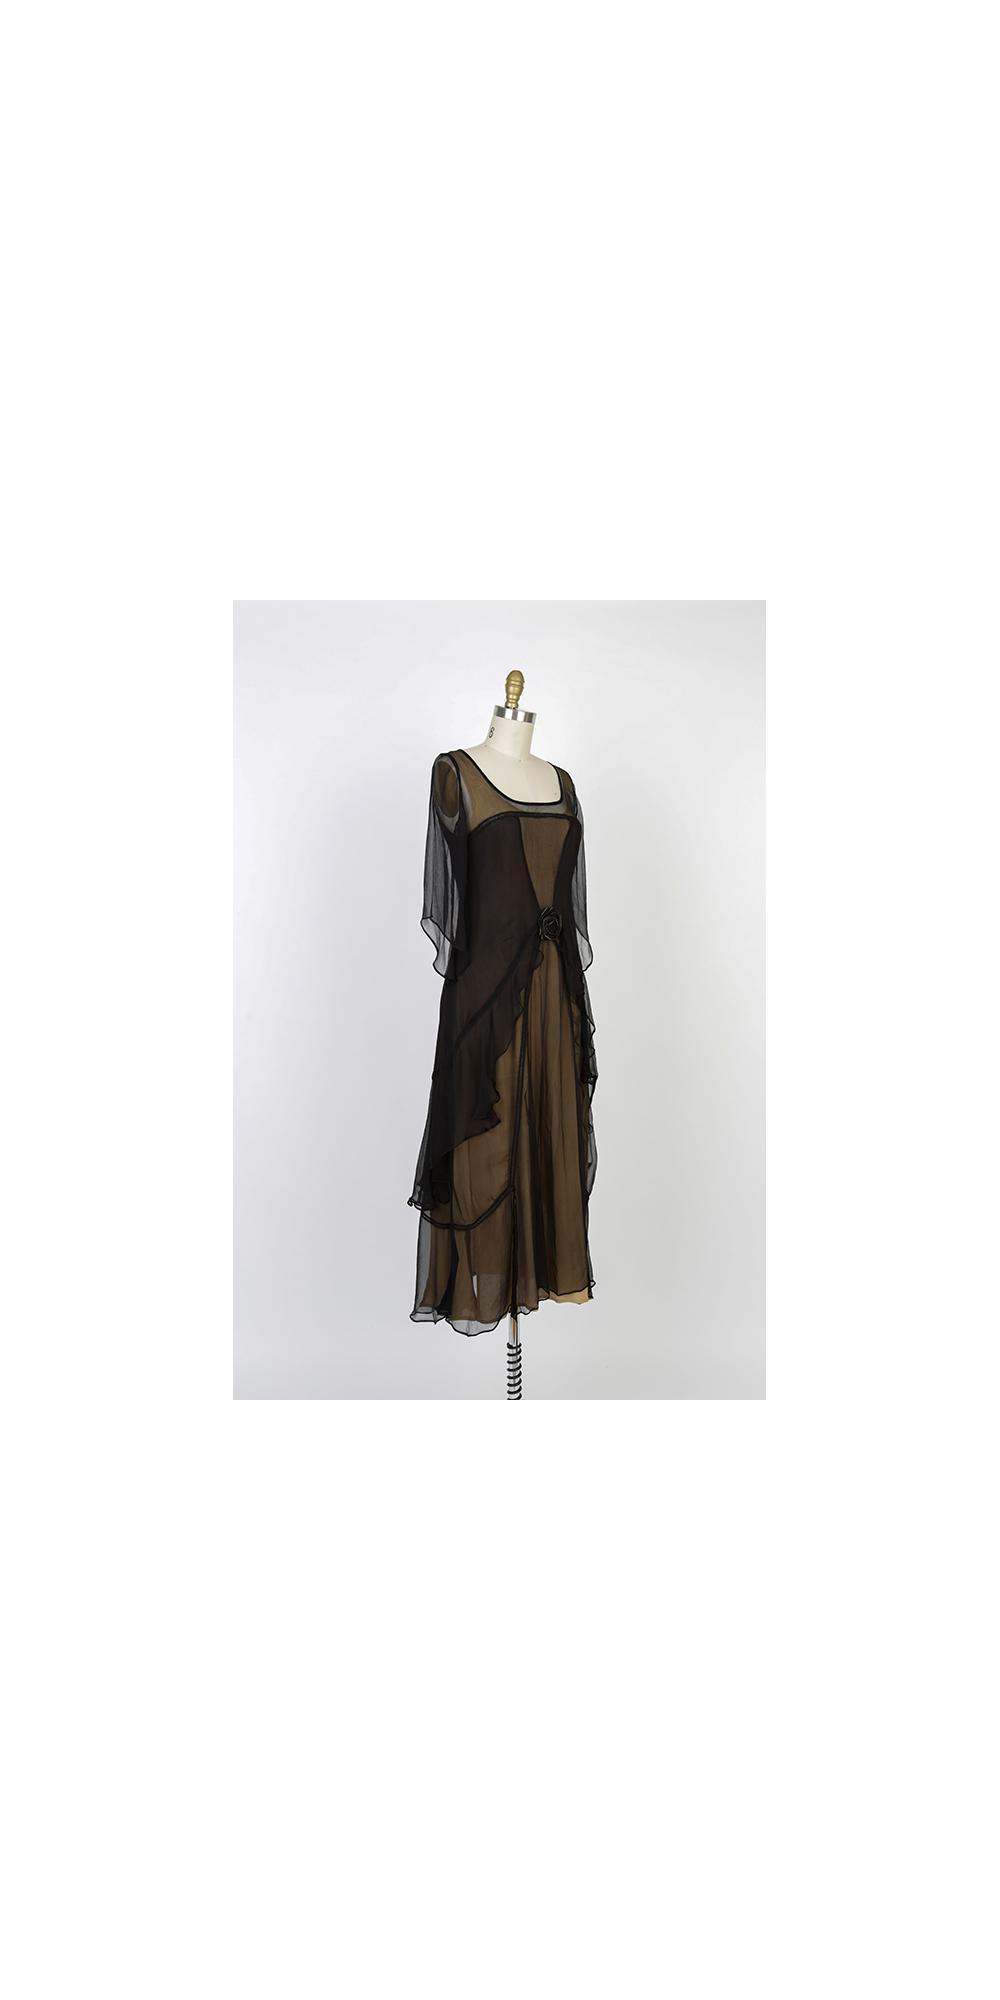 8de07d6f45 Nataya 10709 Great Gatsby Dress in Black Gold